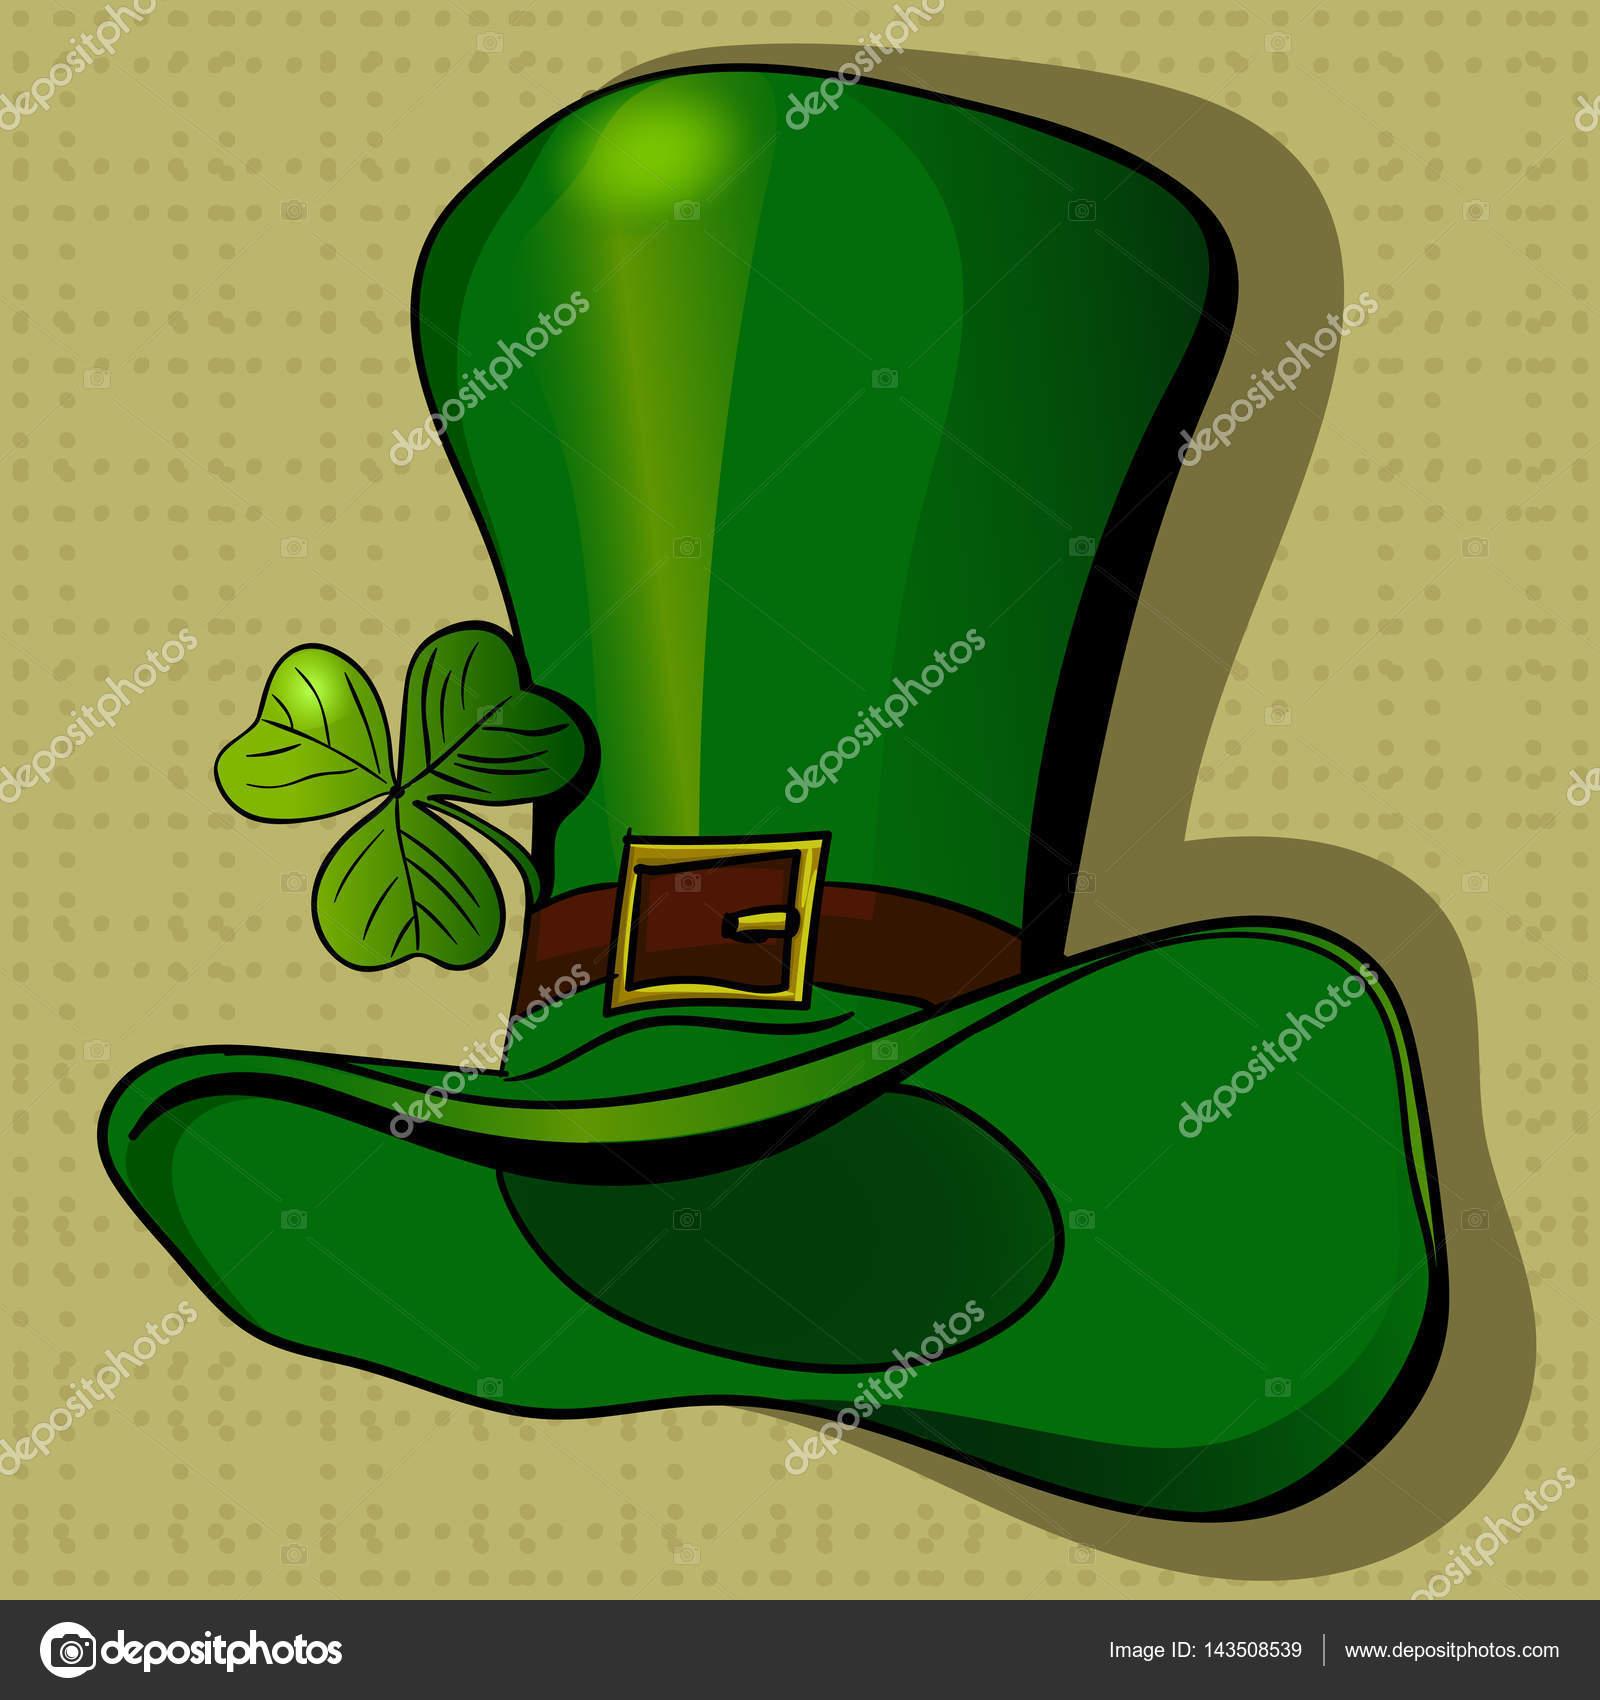 Print The Leprechaun Hat Symbol Of St Patrick S Day Ireland